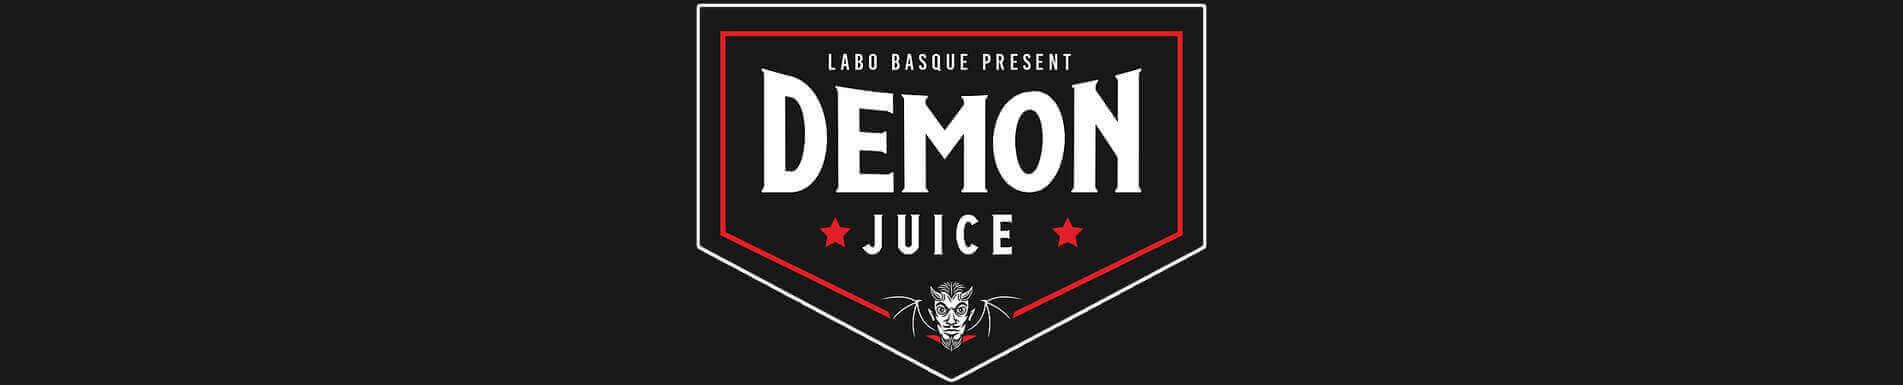 Arômes Demon Juice 30 mL